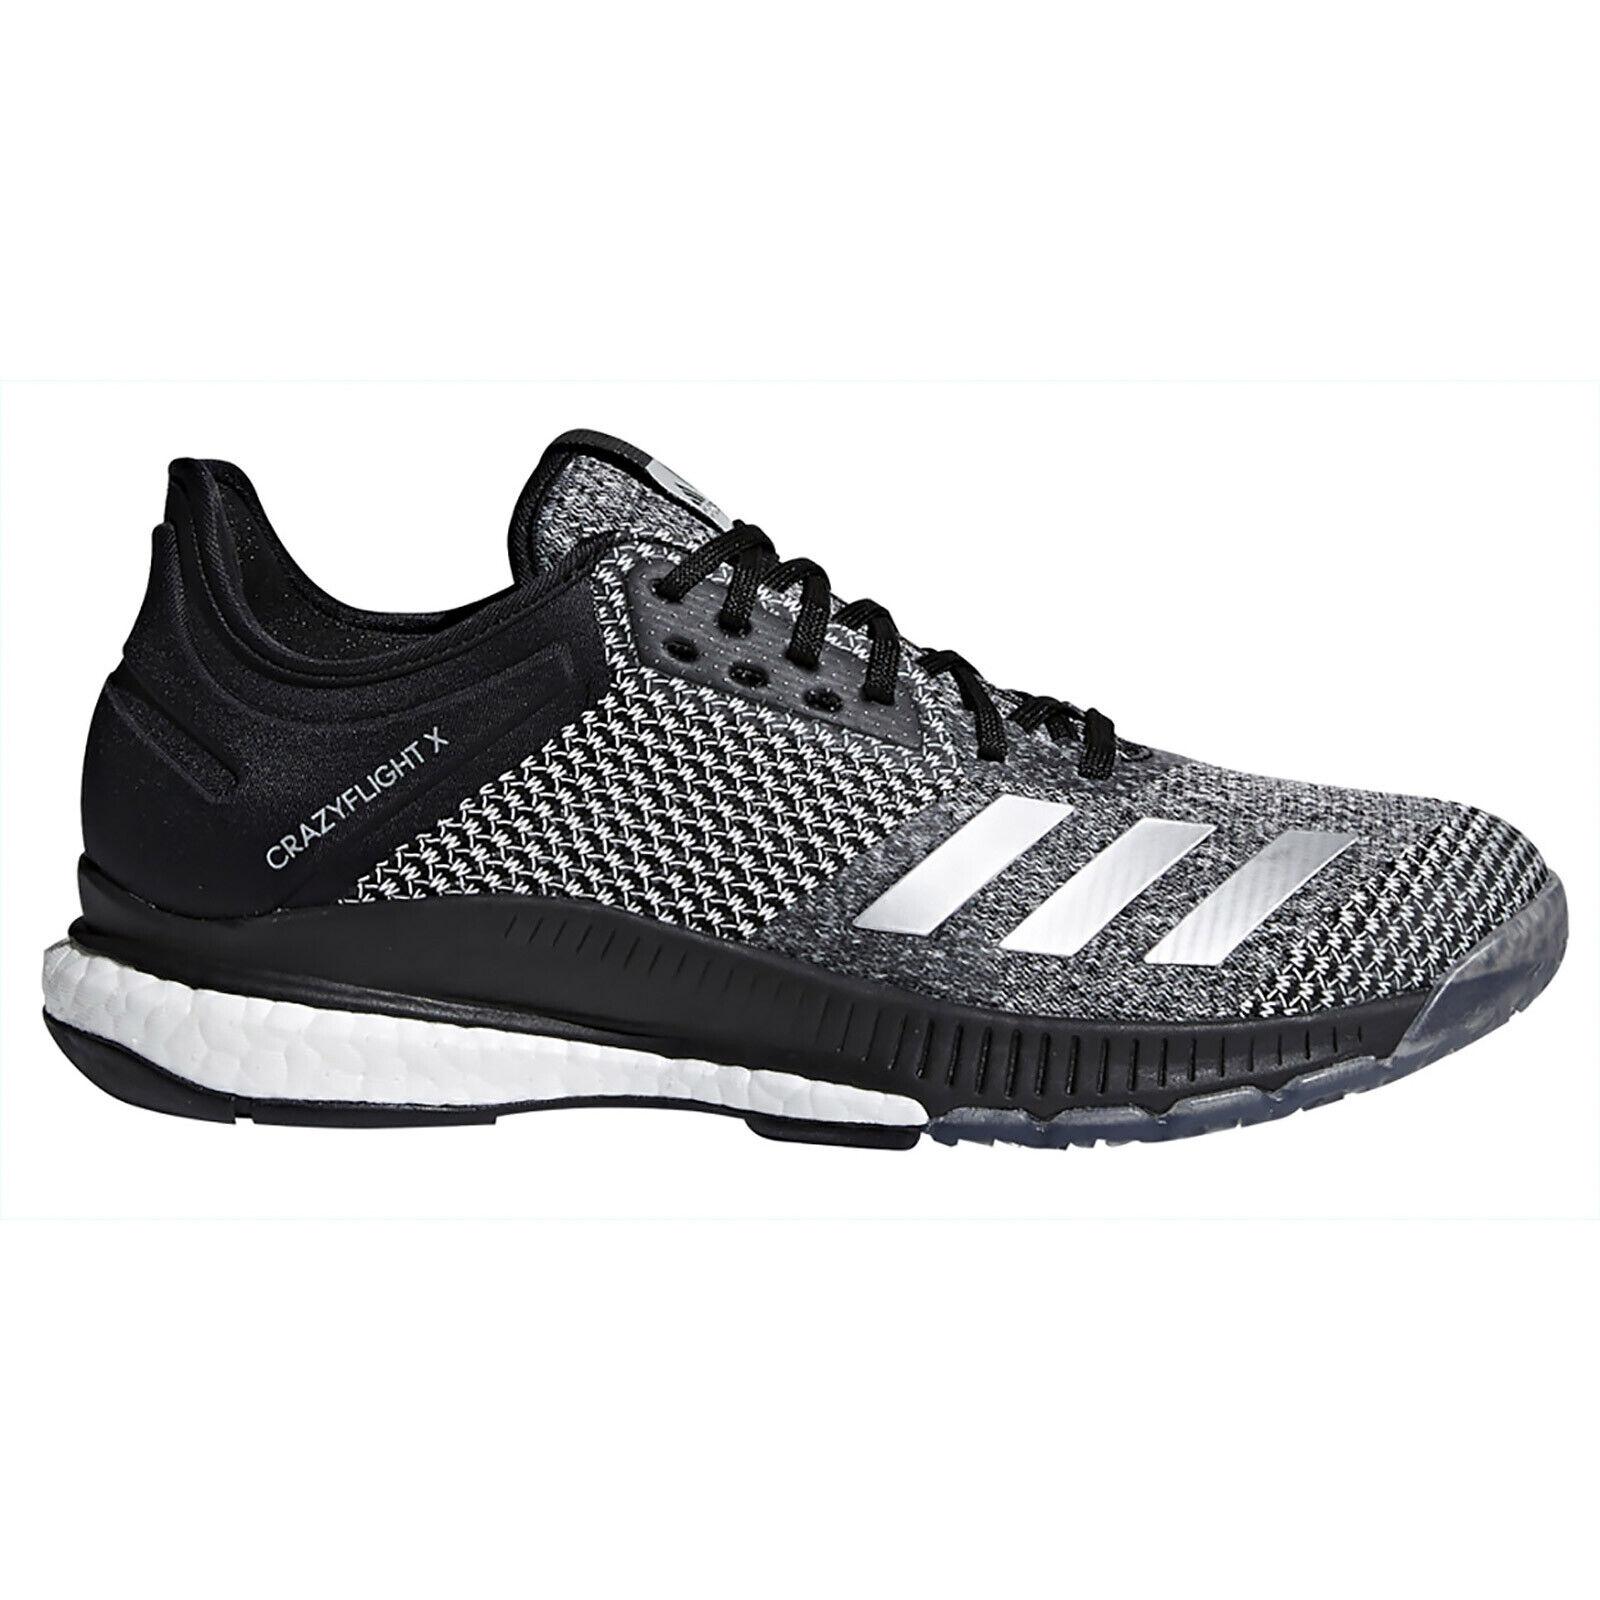 New Women's SZ 9.5 Adidas Crazyflight X 2 Volleyball Shoes B